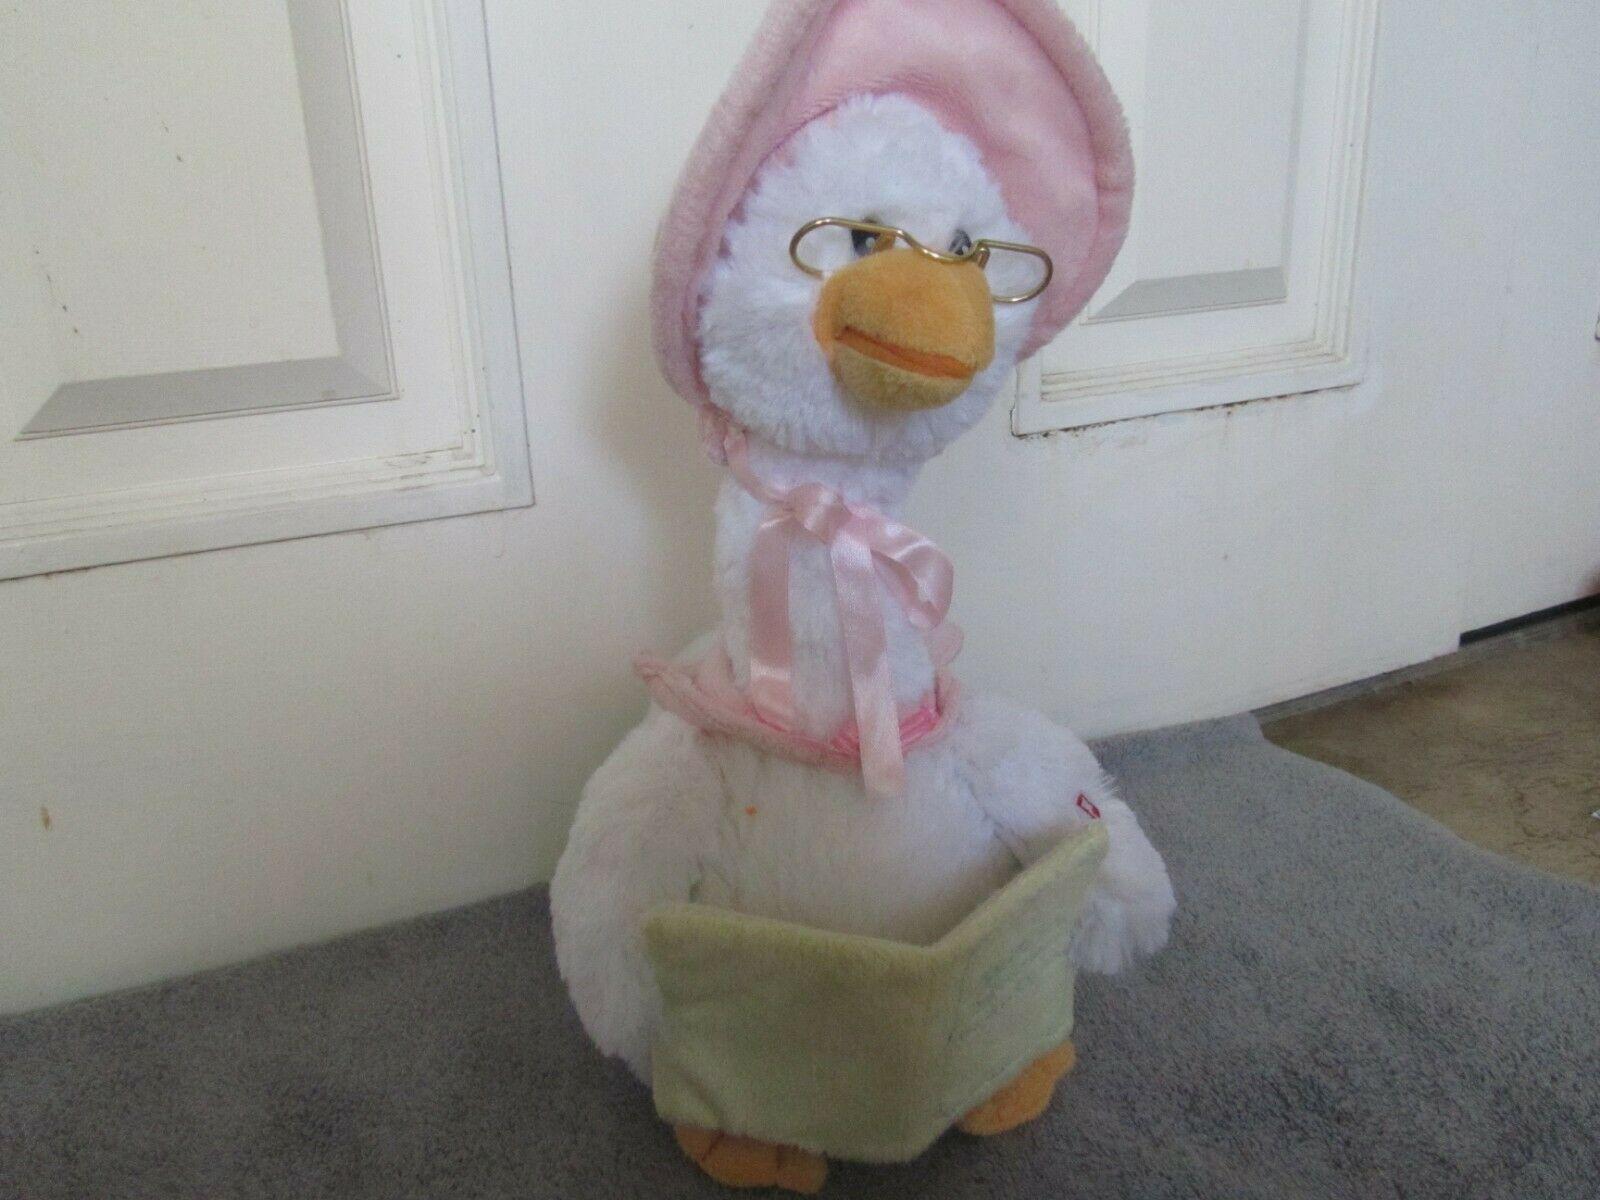 Mother Goose Nursery Rhyme Talking Animated Plush Doll 7 Rhymes Cuddle Barn